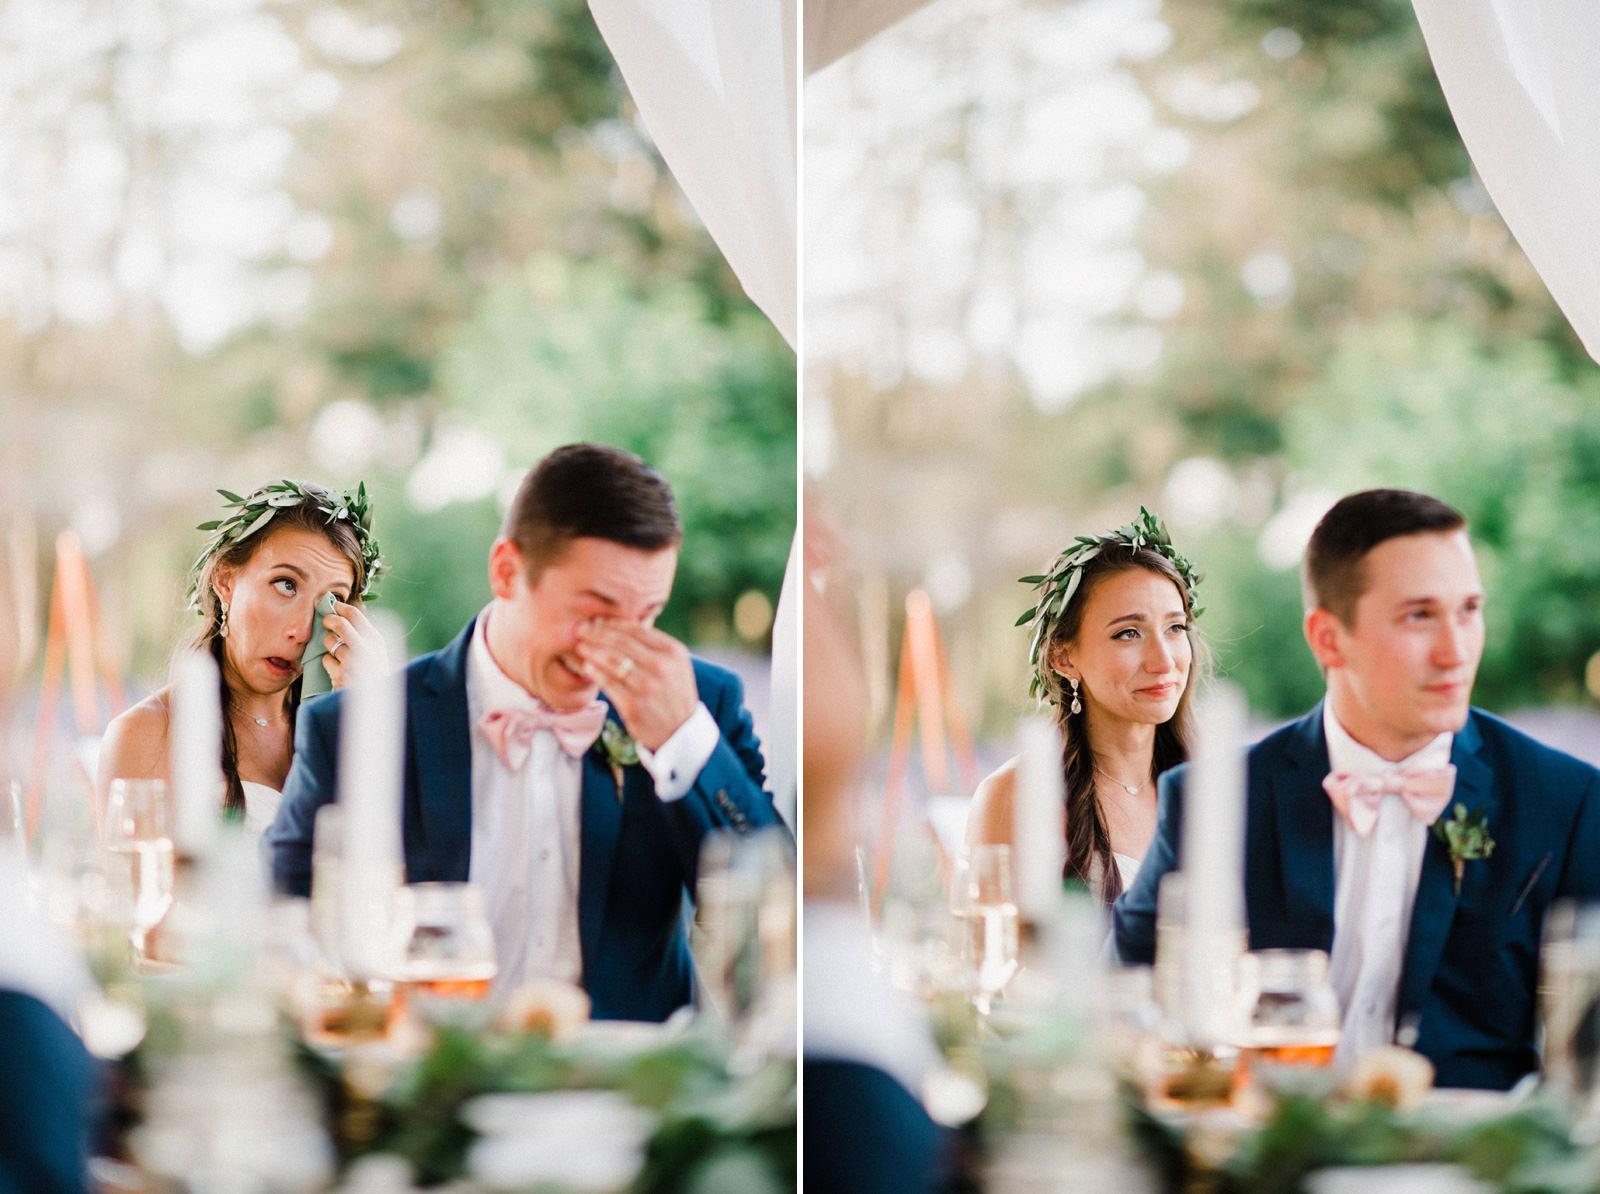 067-woodinville-lavendar-farm-wedding-with-golden-glowy-photos.jpg